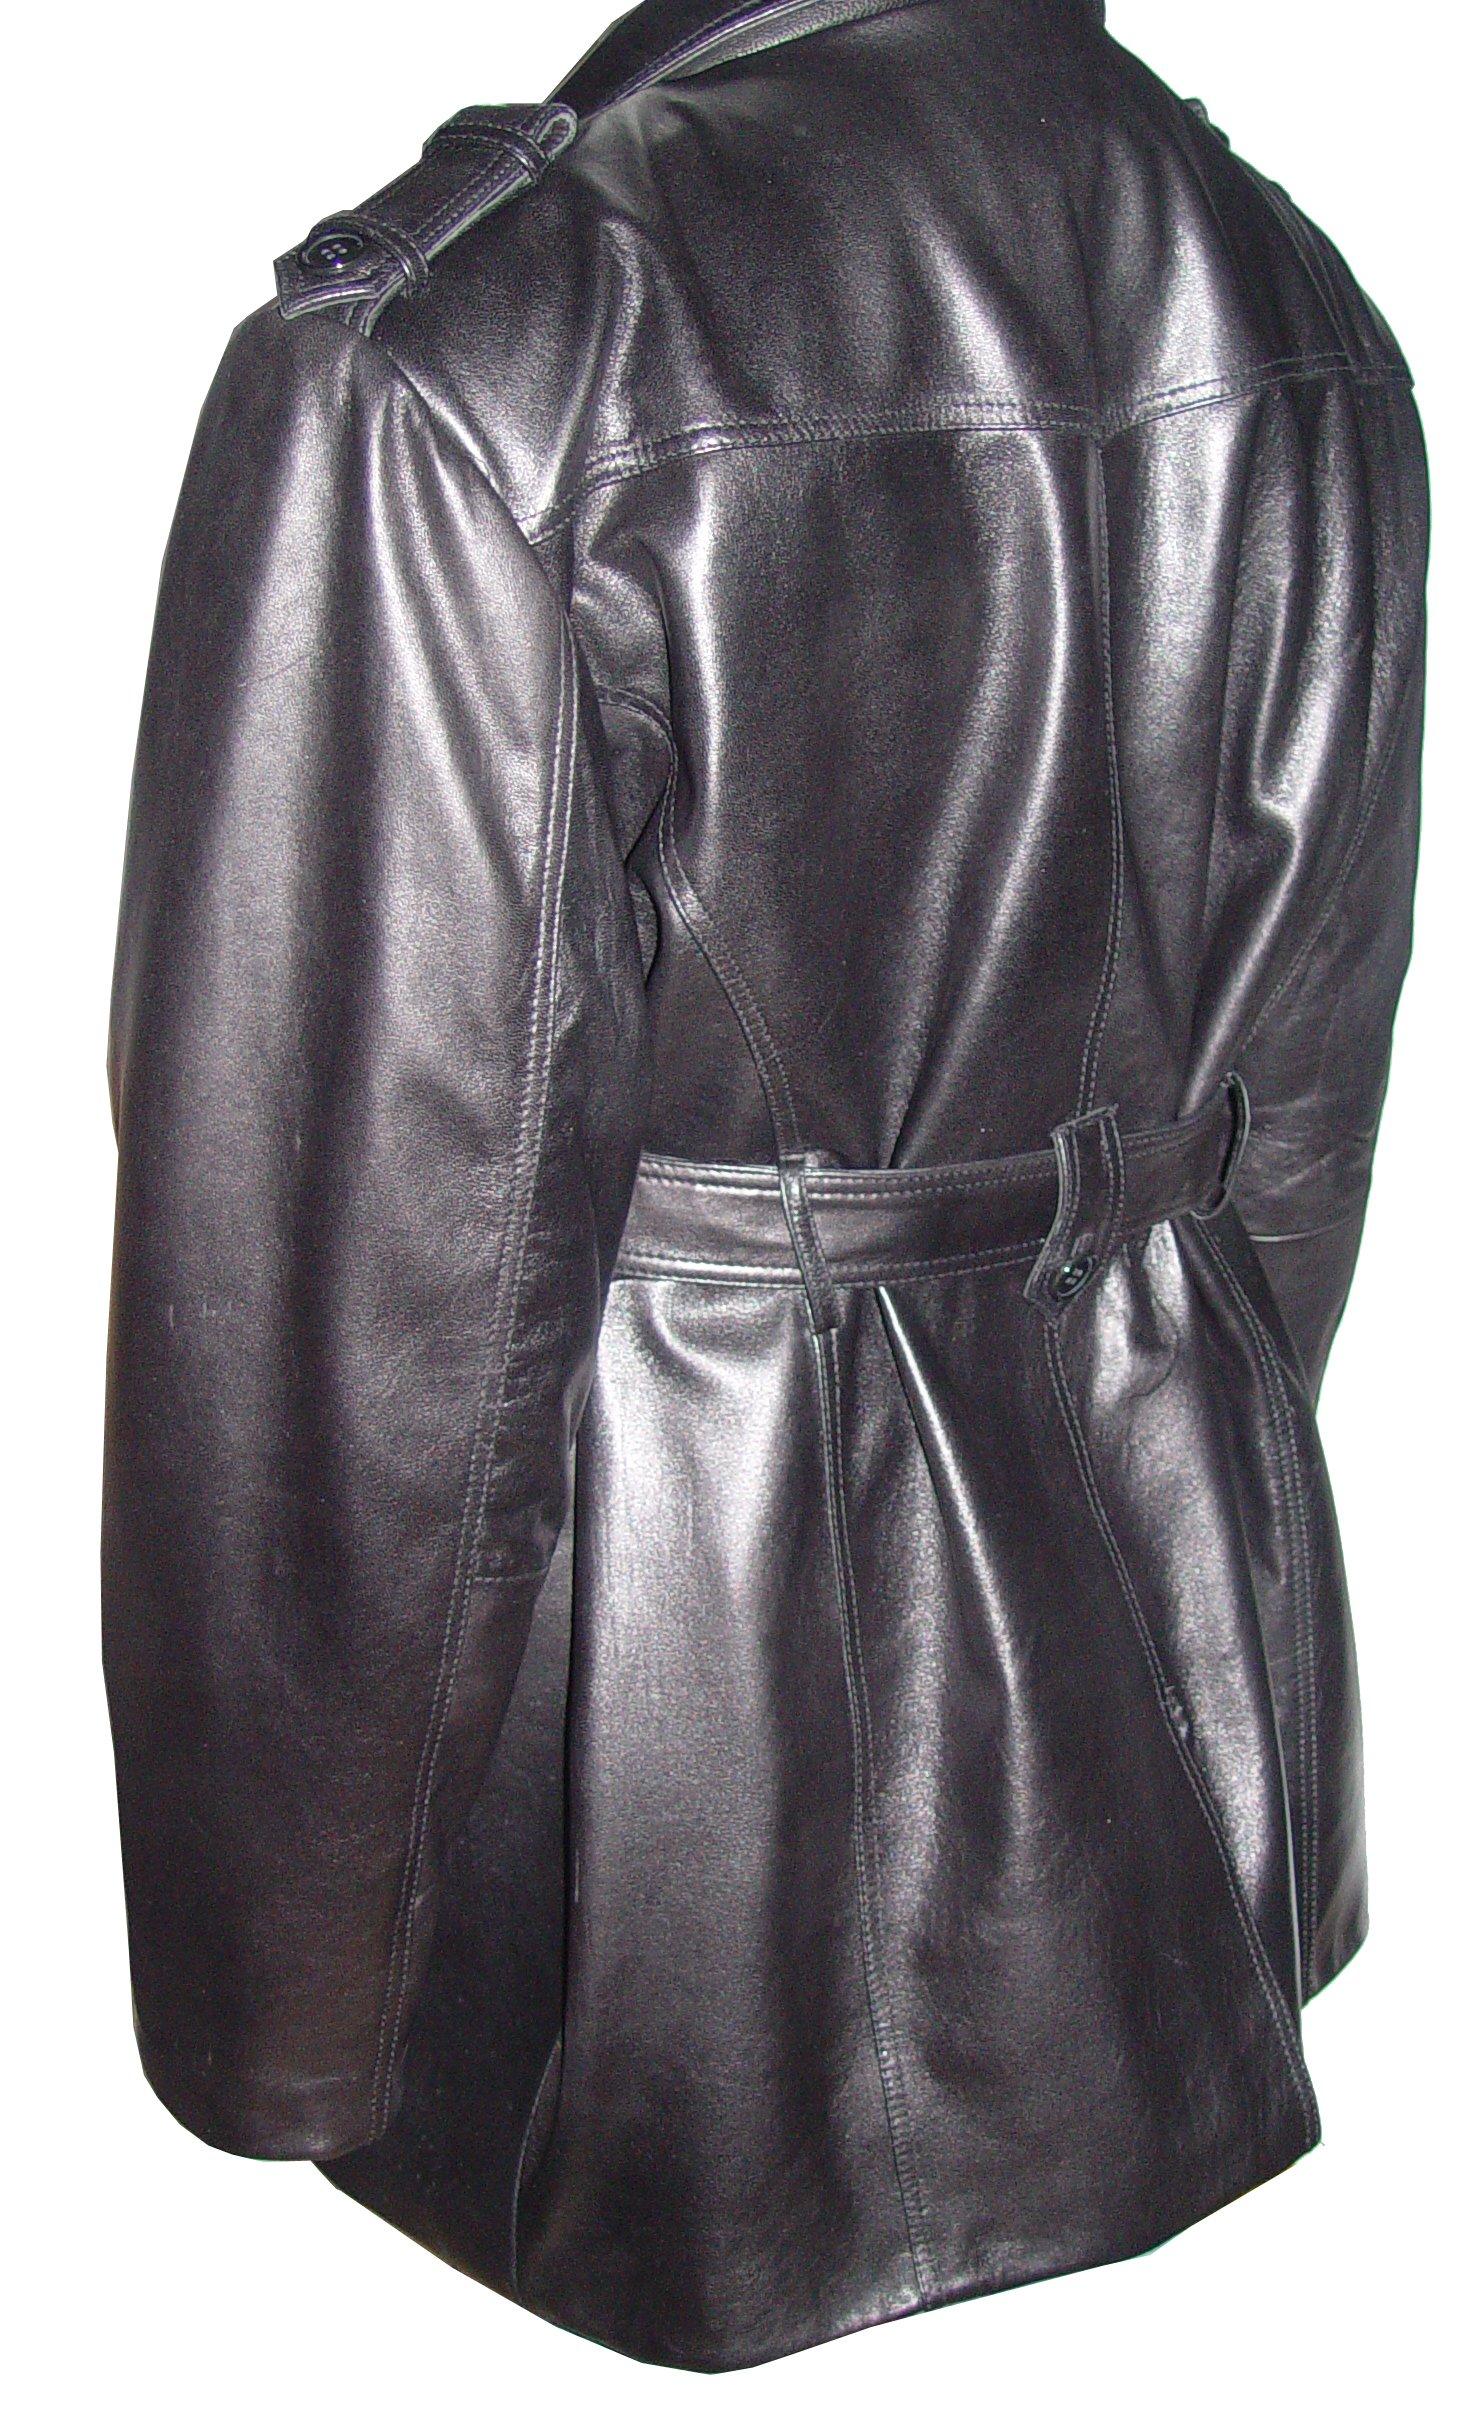 Nettailor 2041 Men Fine Clean Classic Black Leather Trench Coat by NETTAILOR (Image #6)